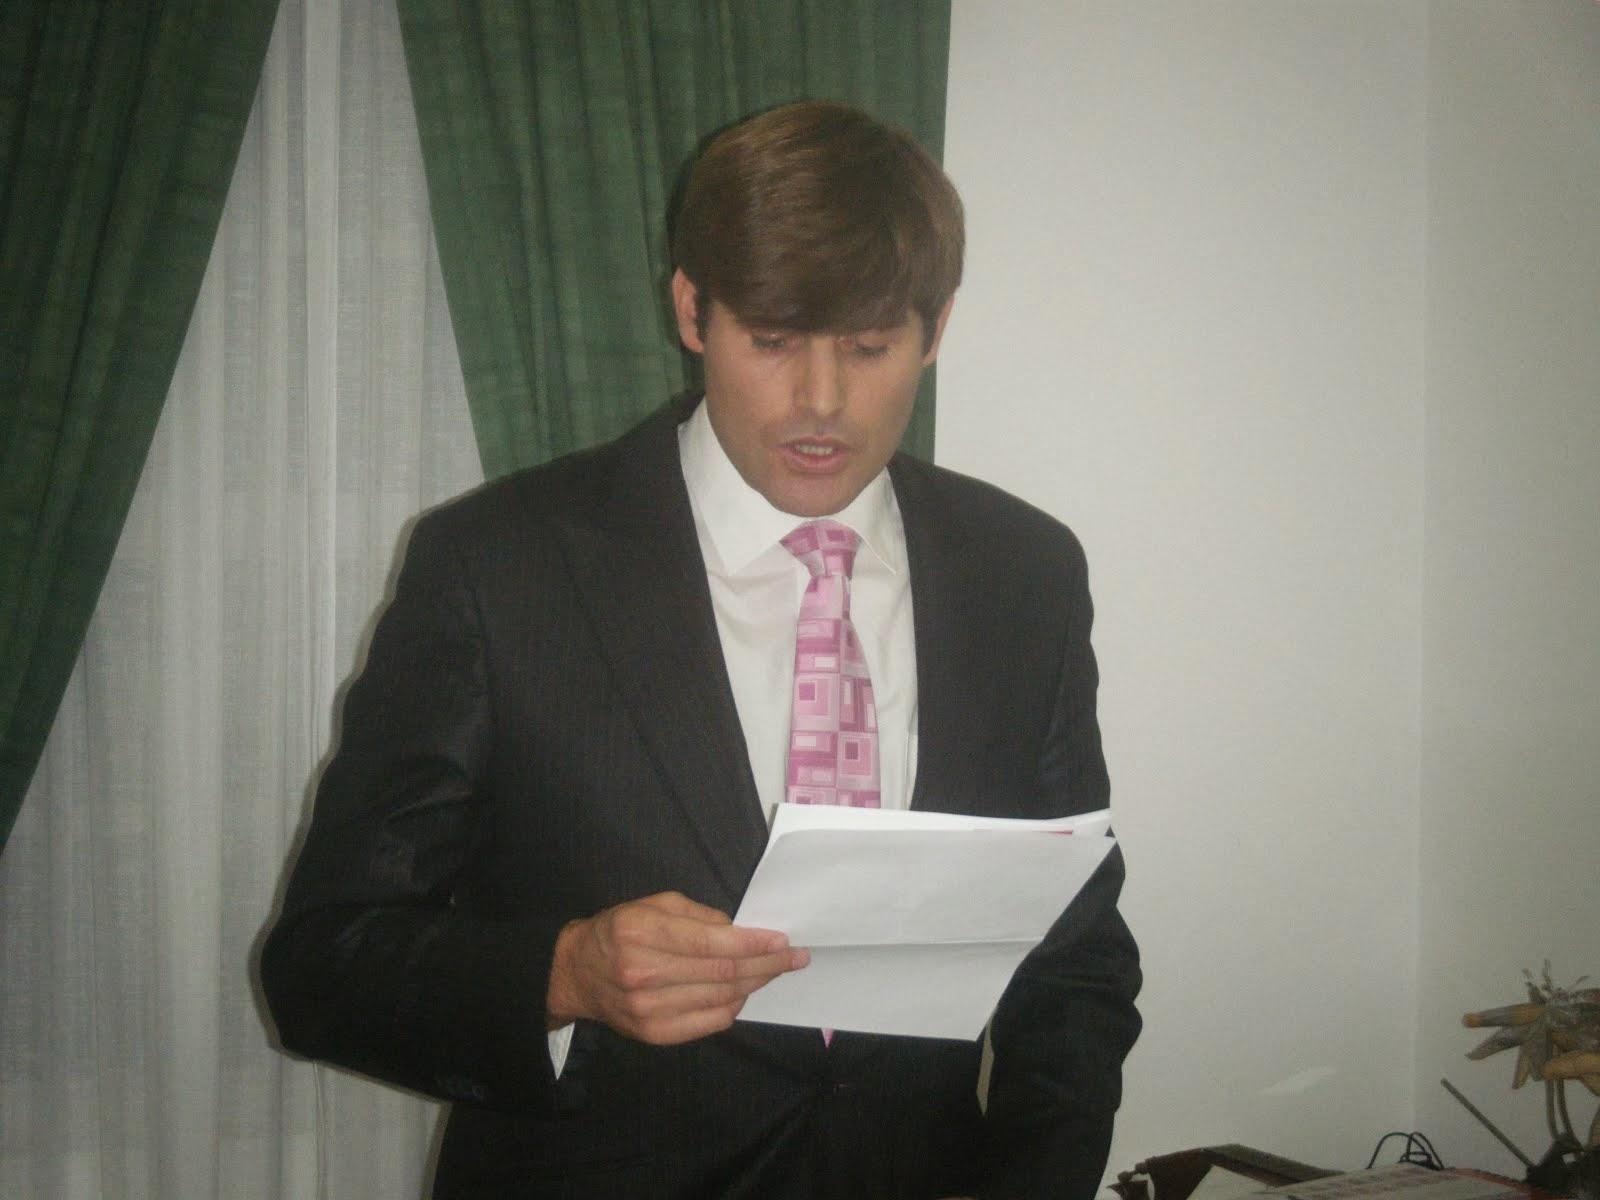 Presidente da Junta de Freguesia